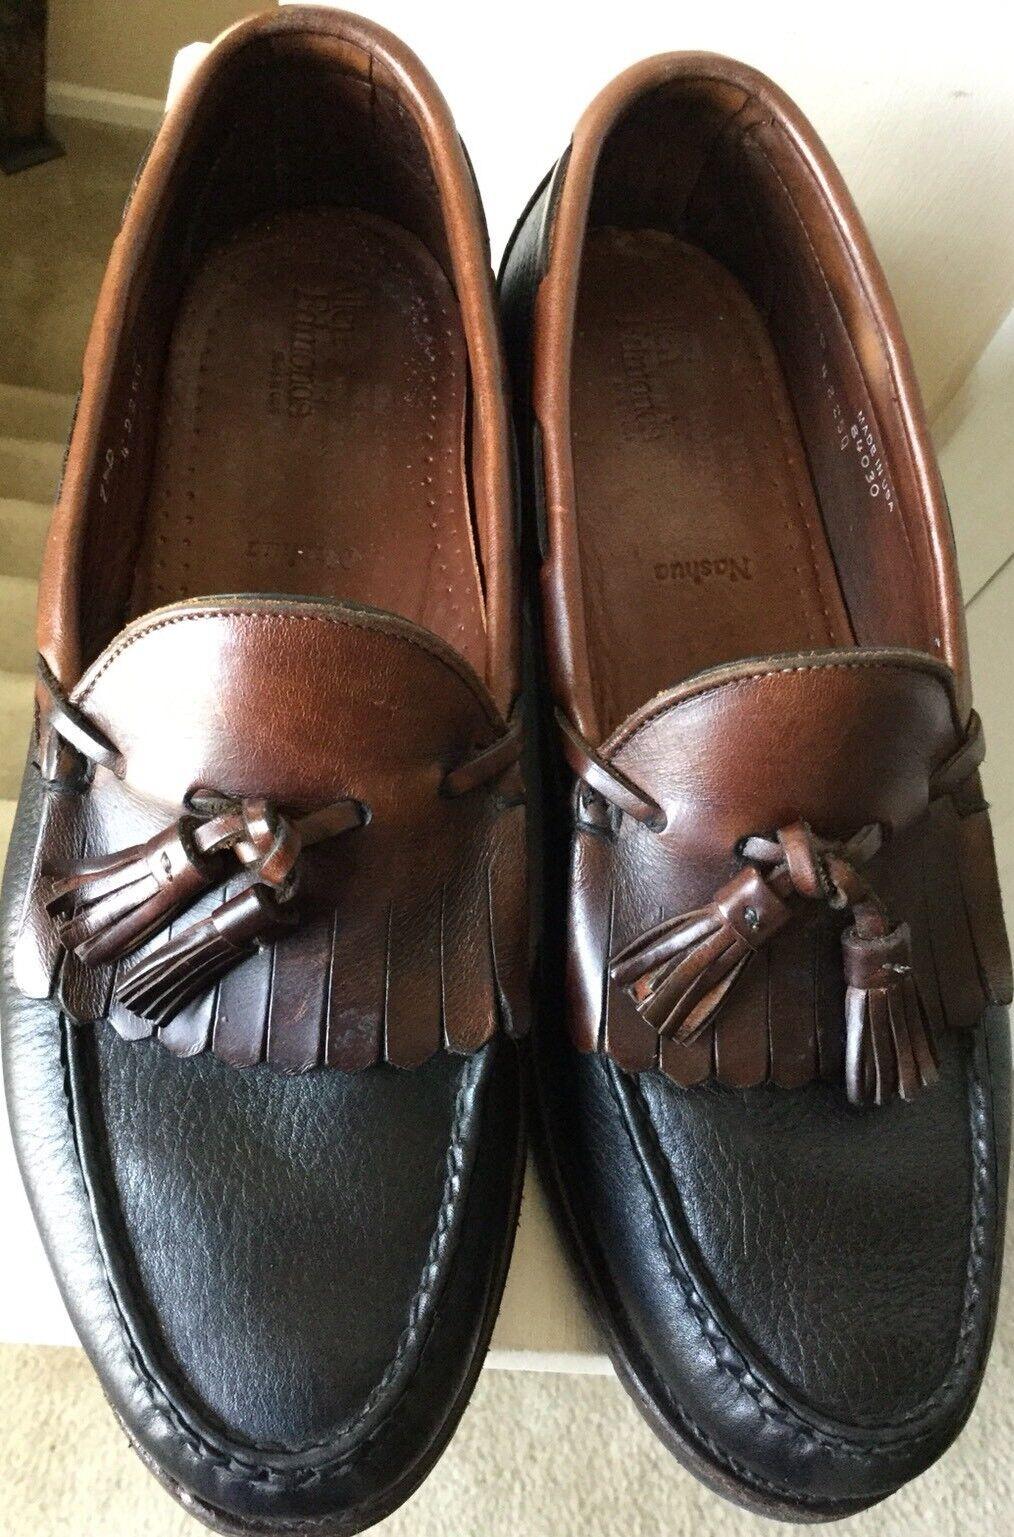 Allen Edmonds Nashua Mens Kiltie Tassel Loafers Size 9.5D Black Brown